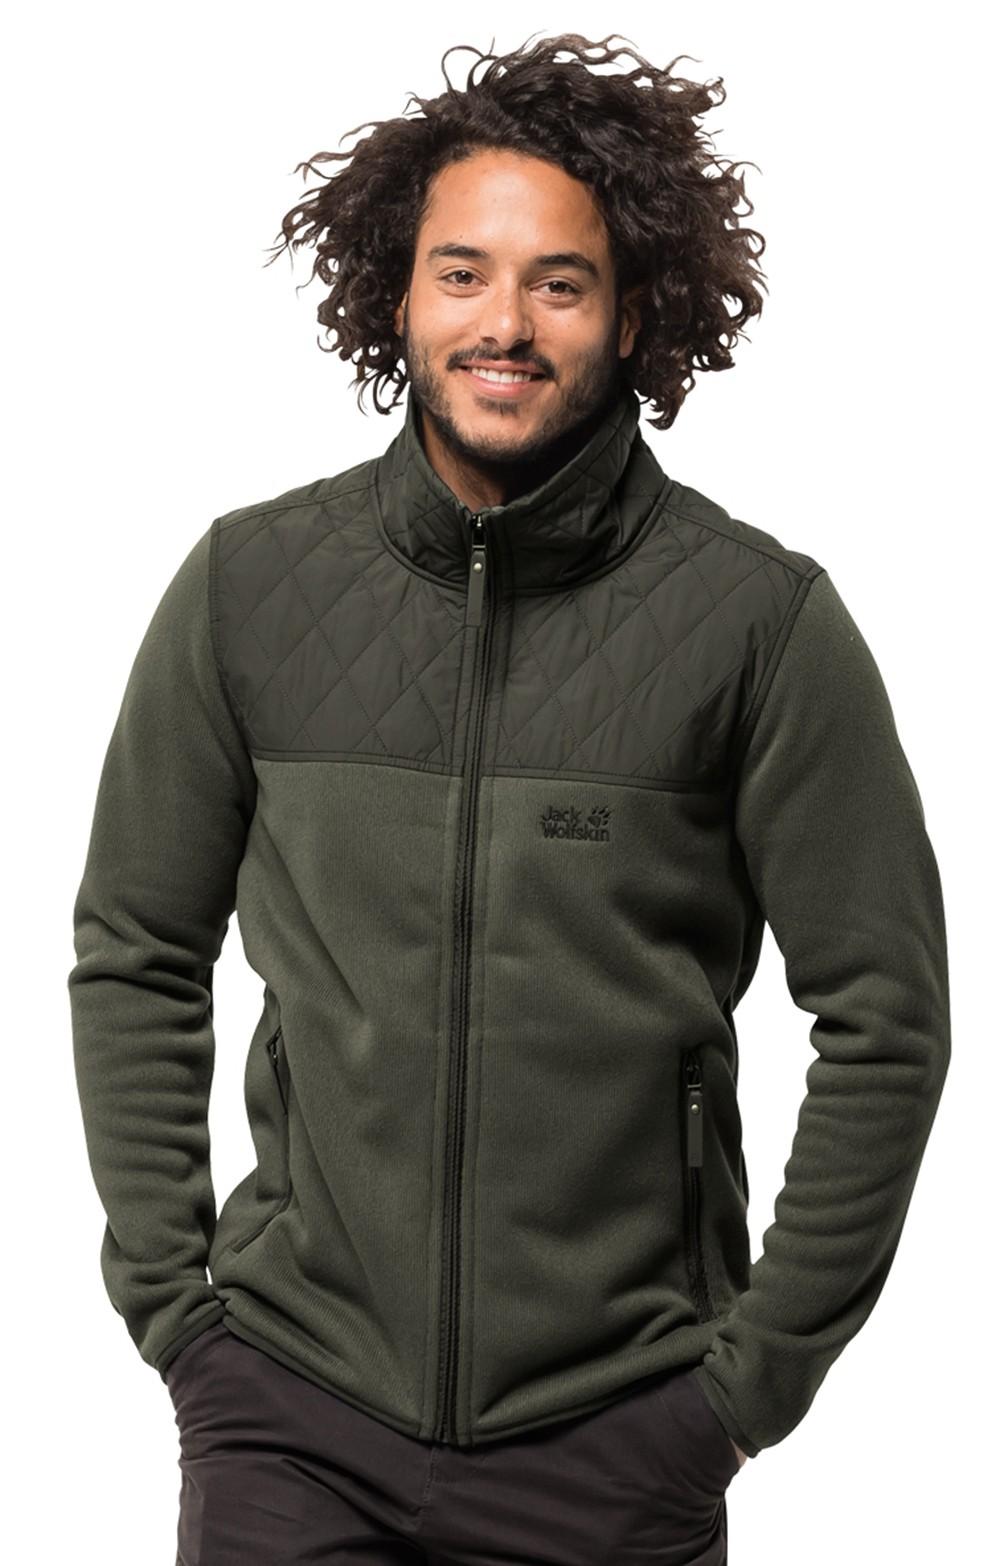 online retailer 345da 24f1f Men's Jack Wolfskin Mackenzie River Fleece Jacket